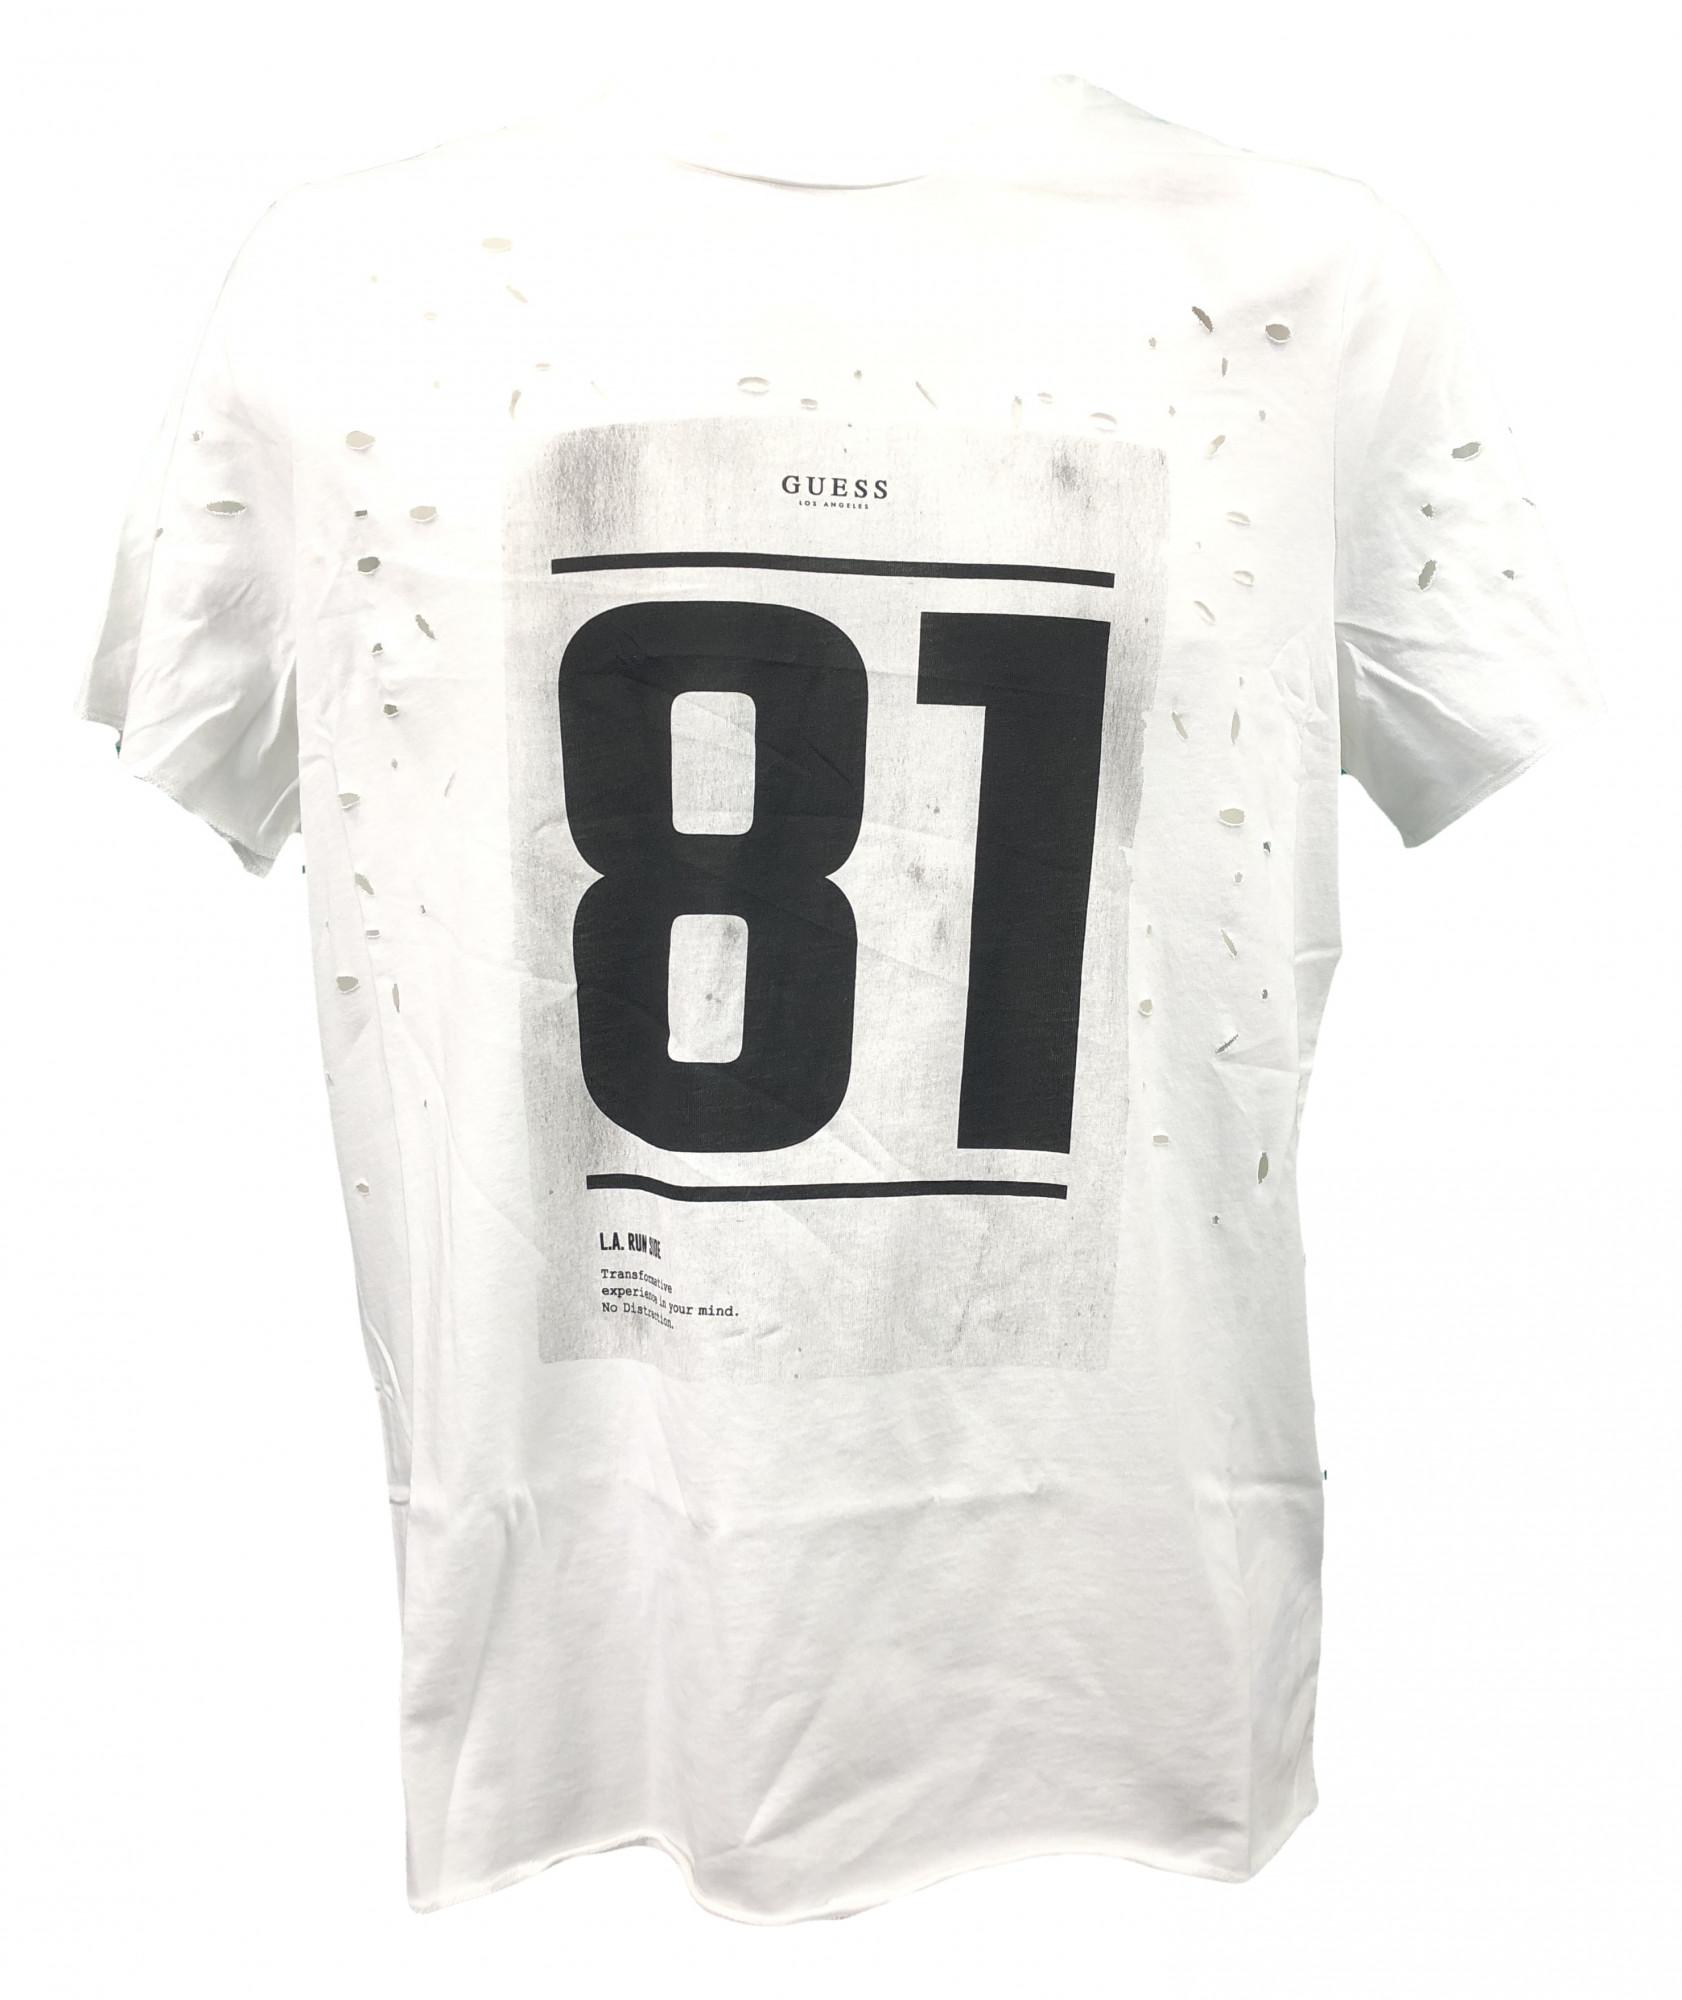 129937c76c Pánské tričko U92A05JR03D - Guess bílá L